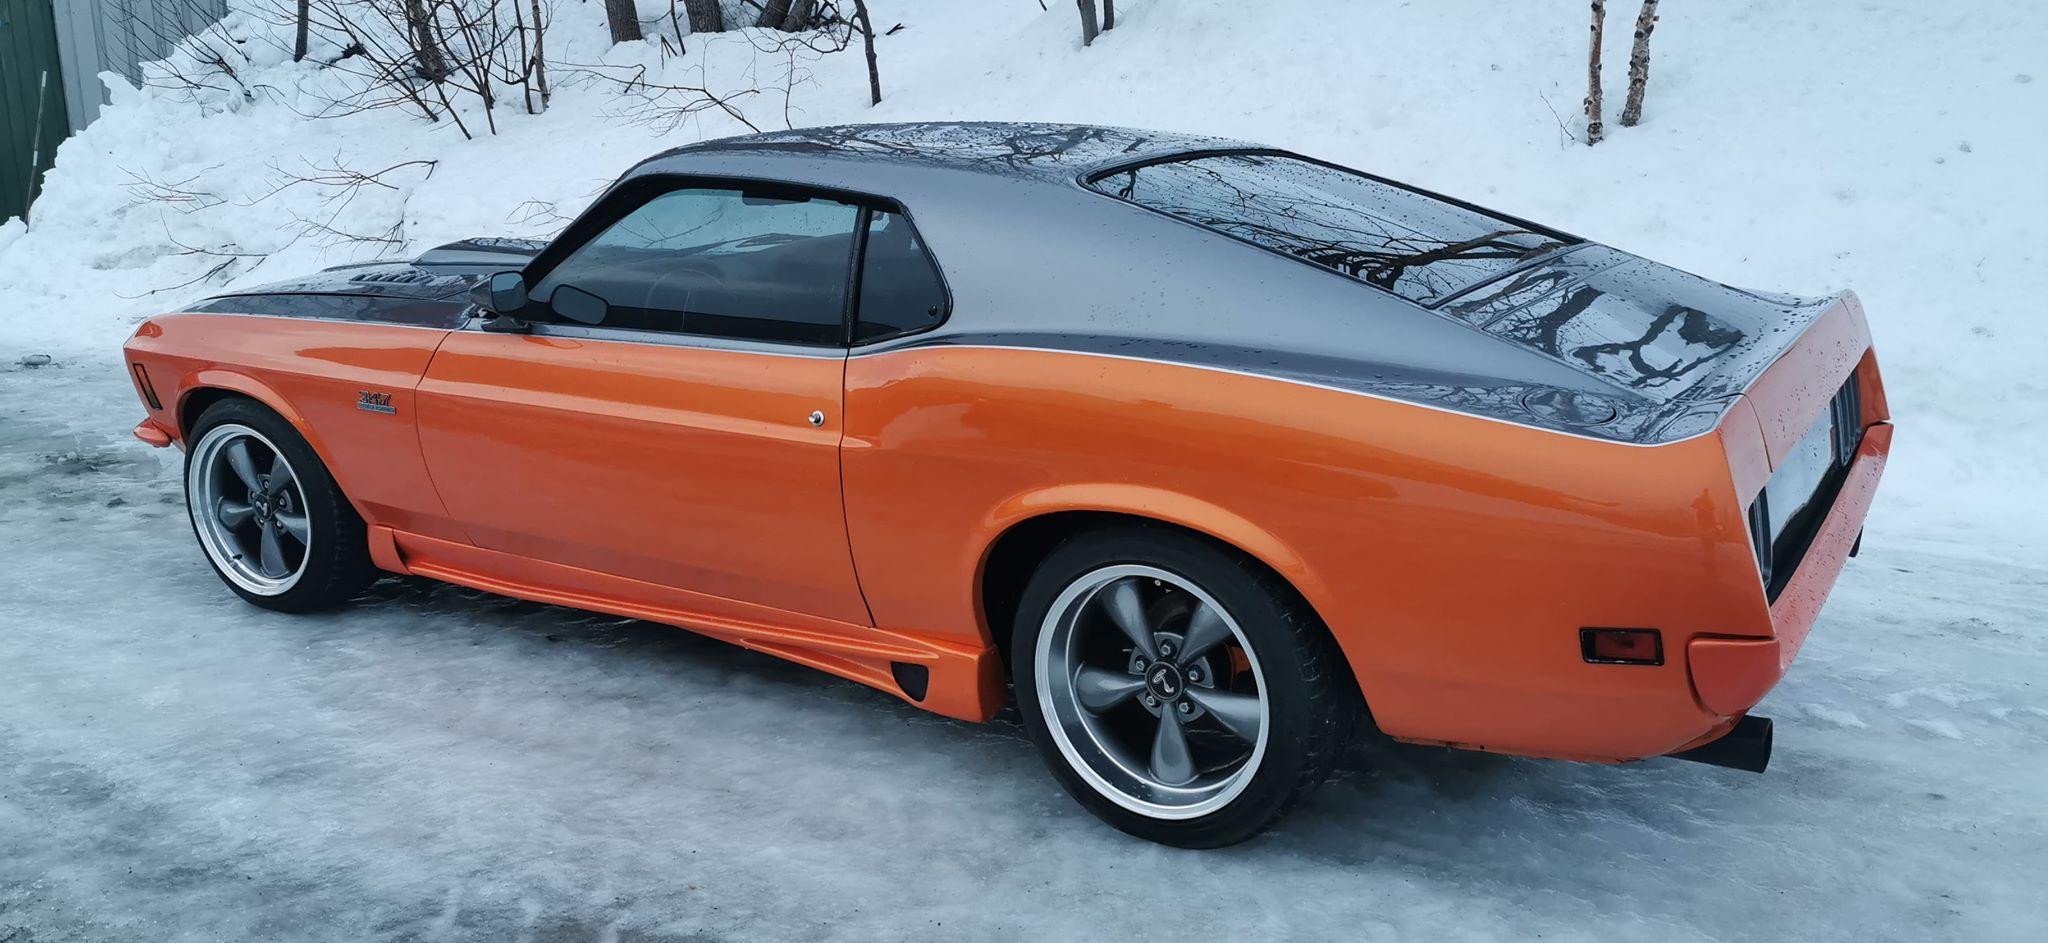 Ukas bil – 1970 Ford Mustang SportsRoof